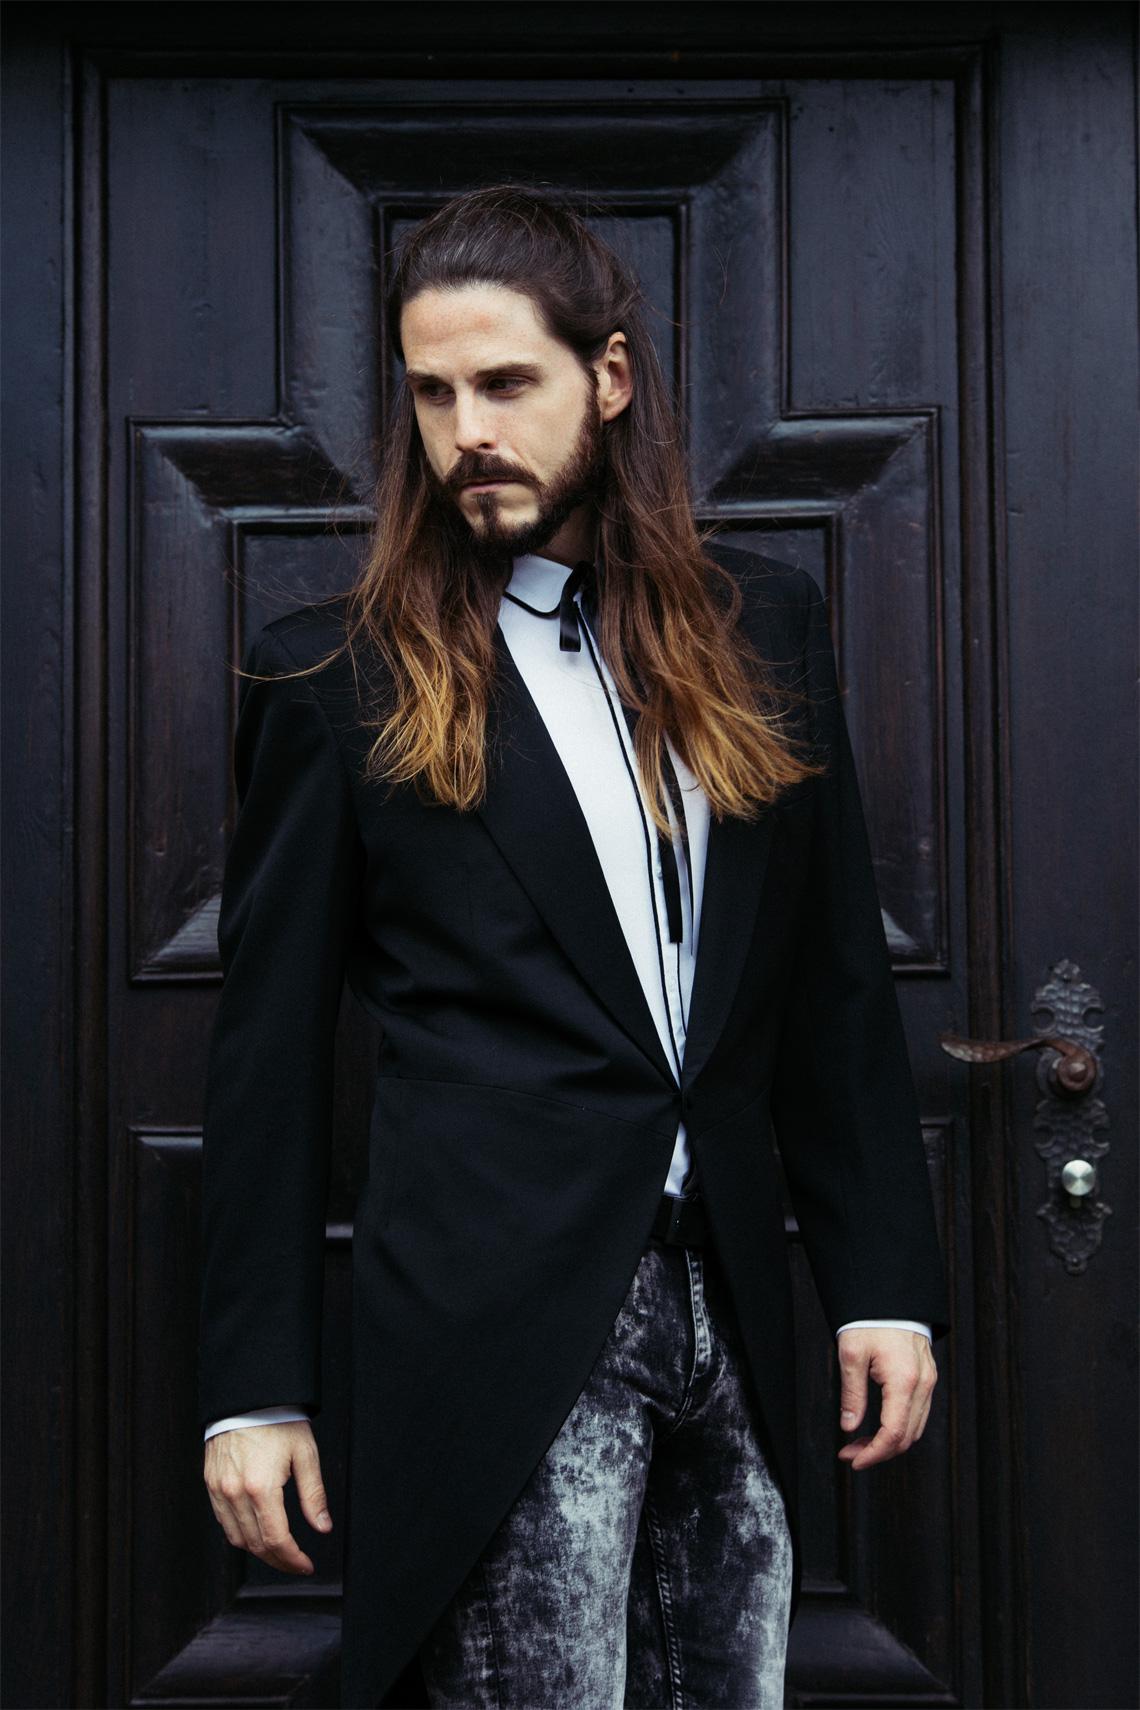 Kaisers-neue-Kleider-Männermode-Blog-Luxus-Frack-Yves-Saint-Laurent-Skinny-Jeans-kombiniert-Outfit